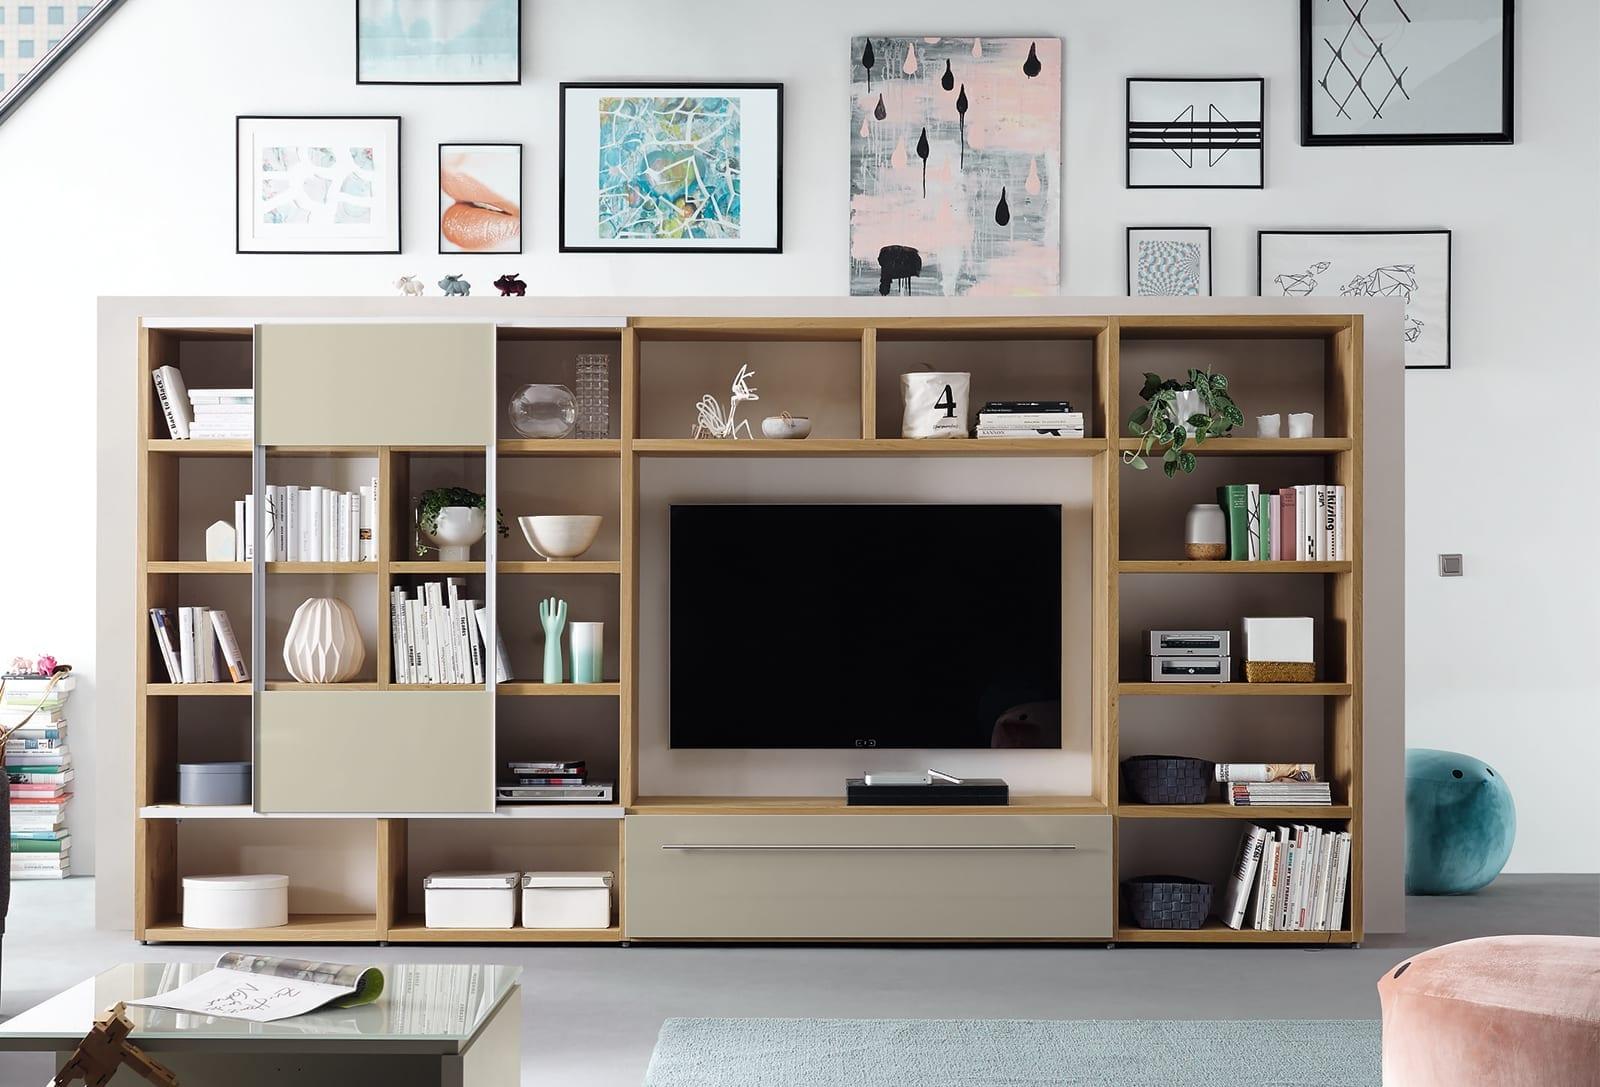 h lsta time nappali kombin ci xi. Black Bedroom Furniture Sets. Home Design Ideas